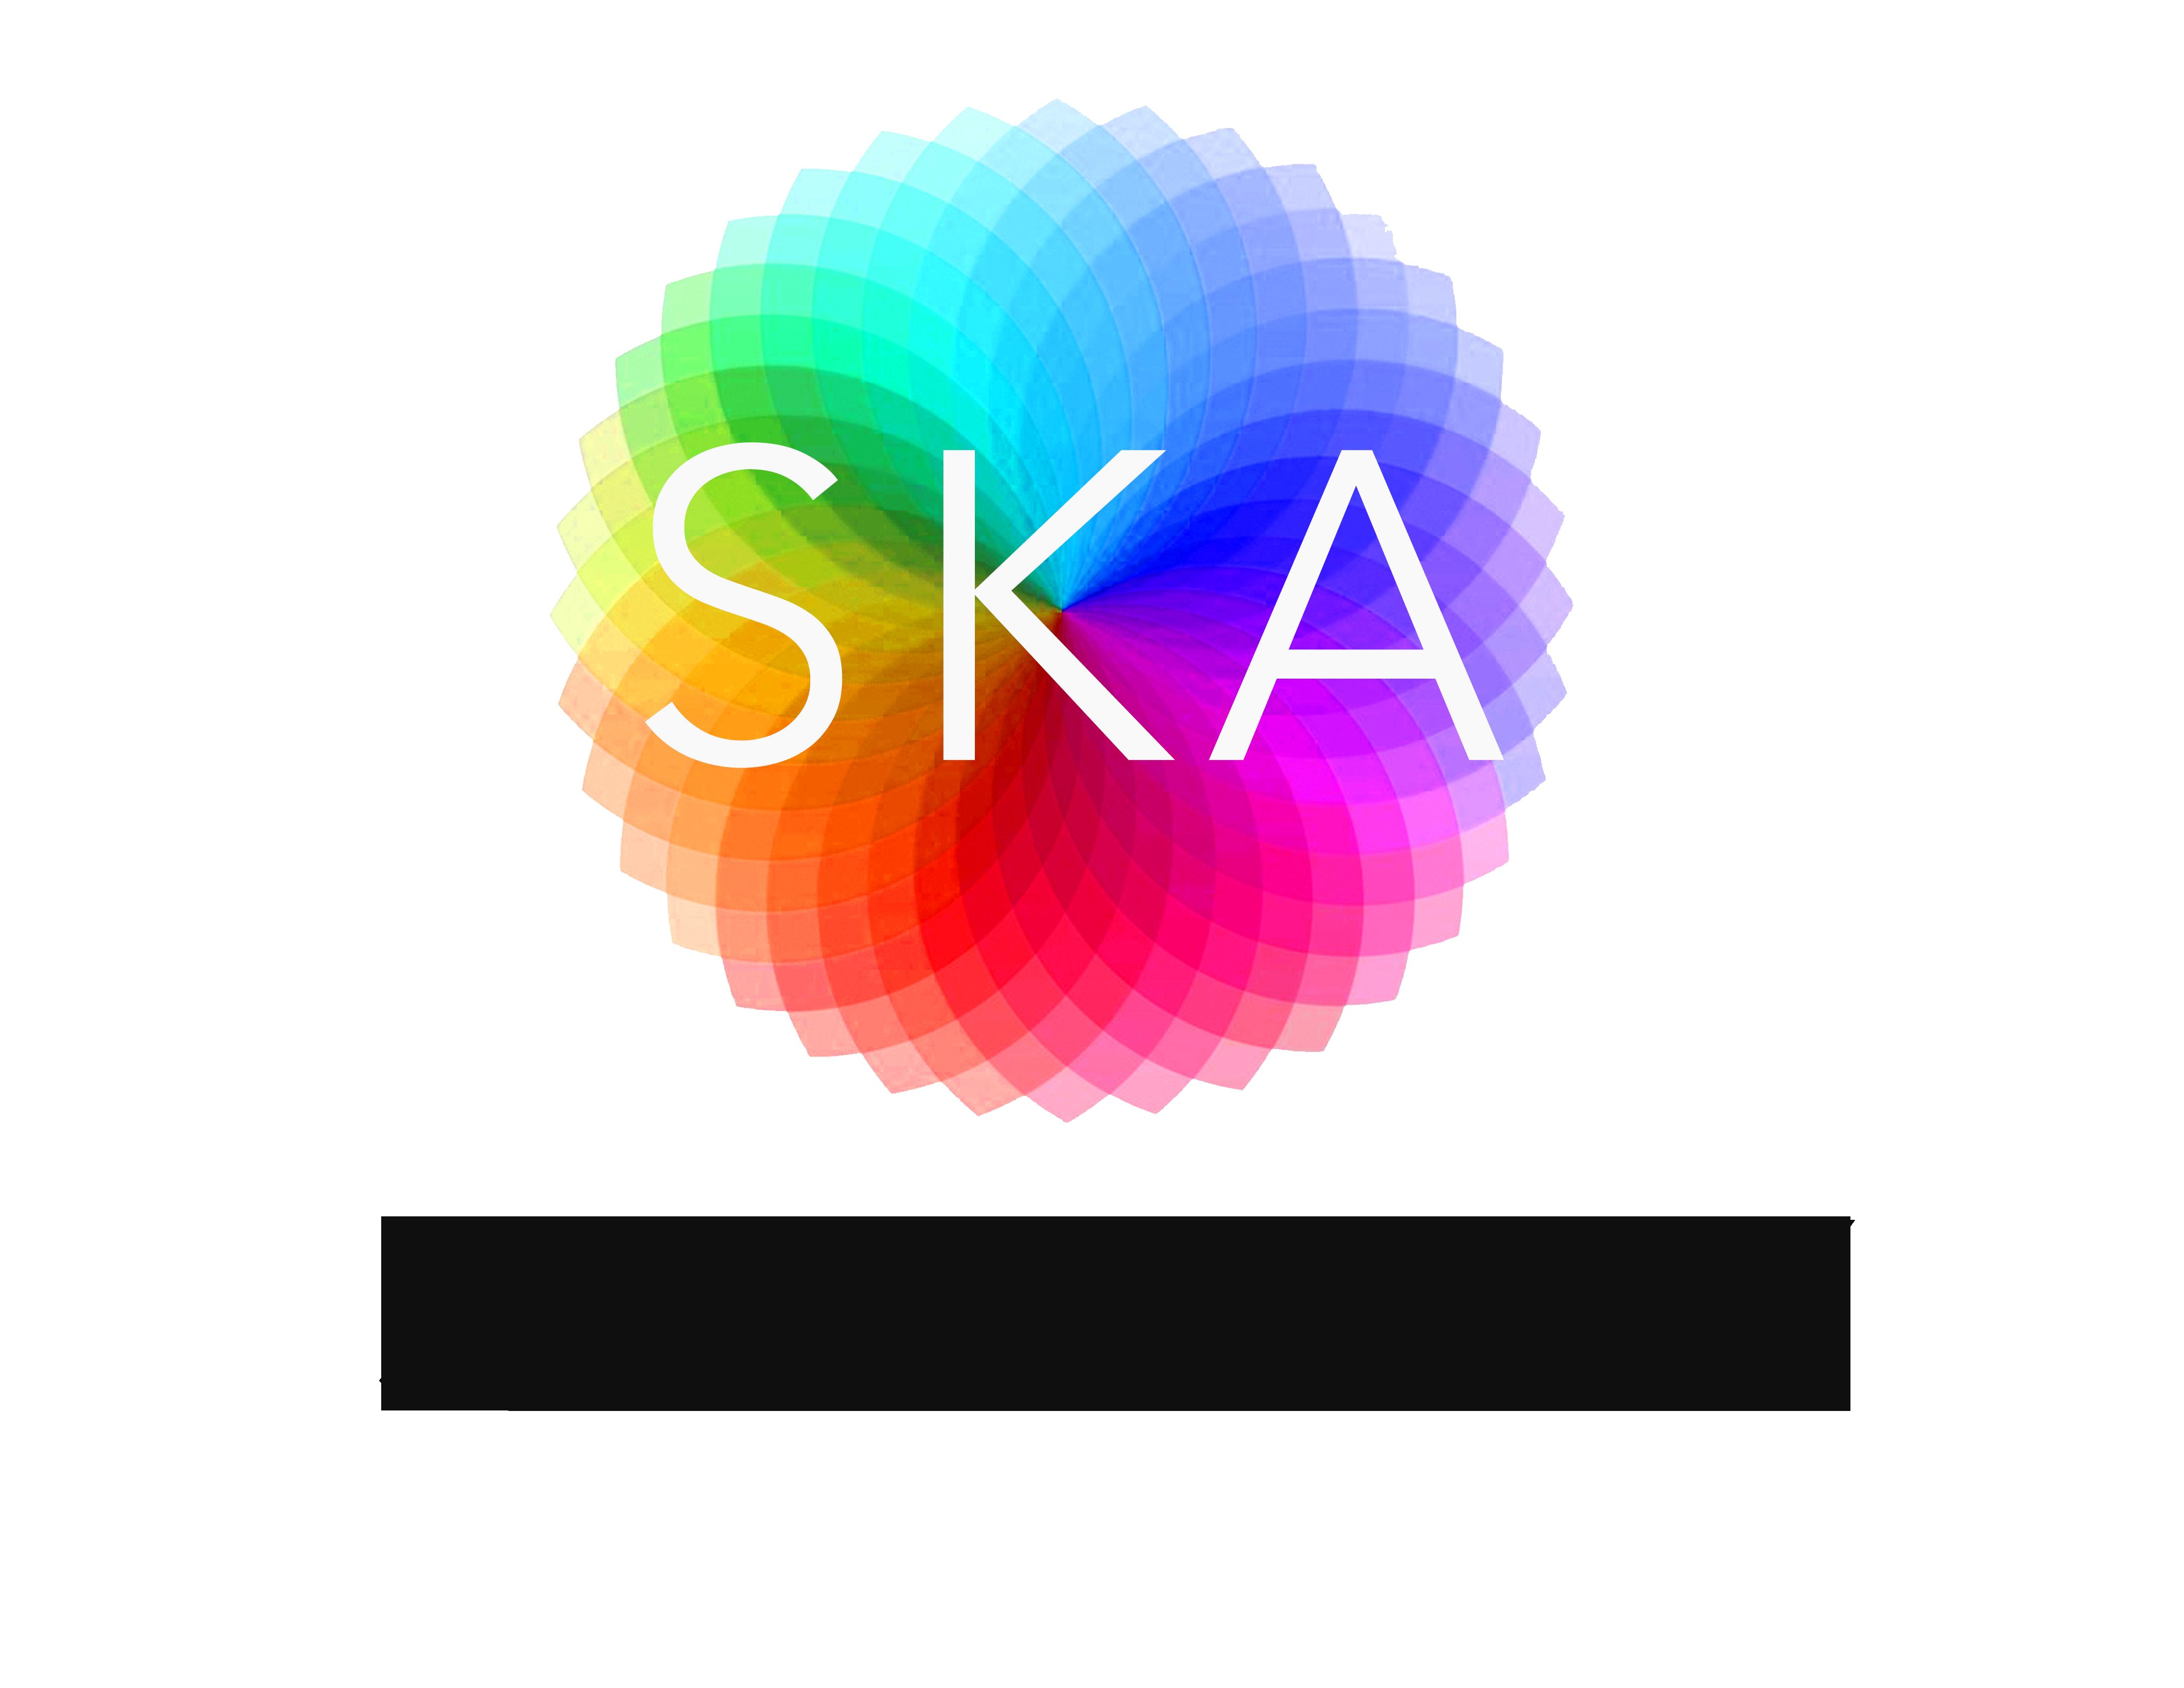 SKAOLOGY